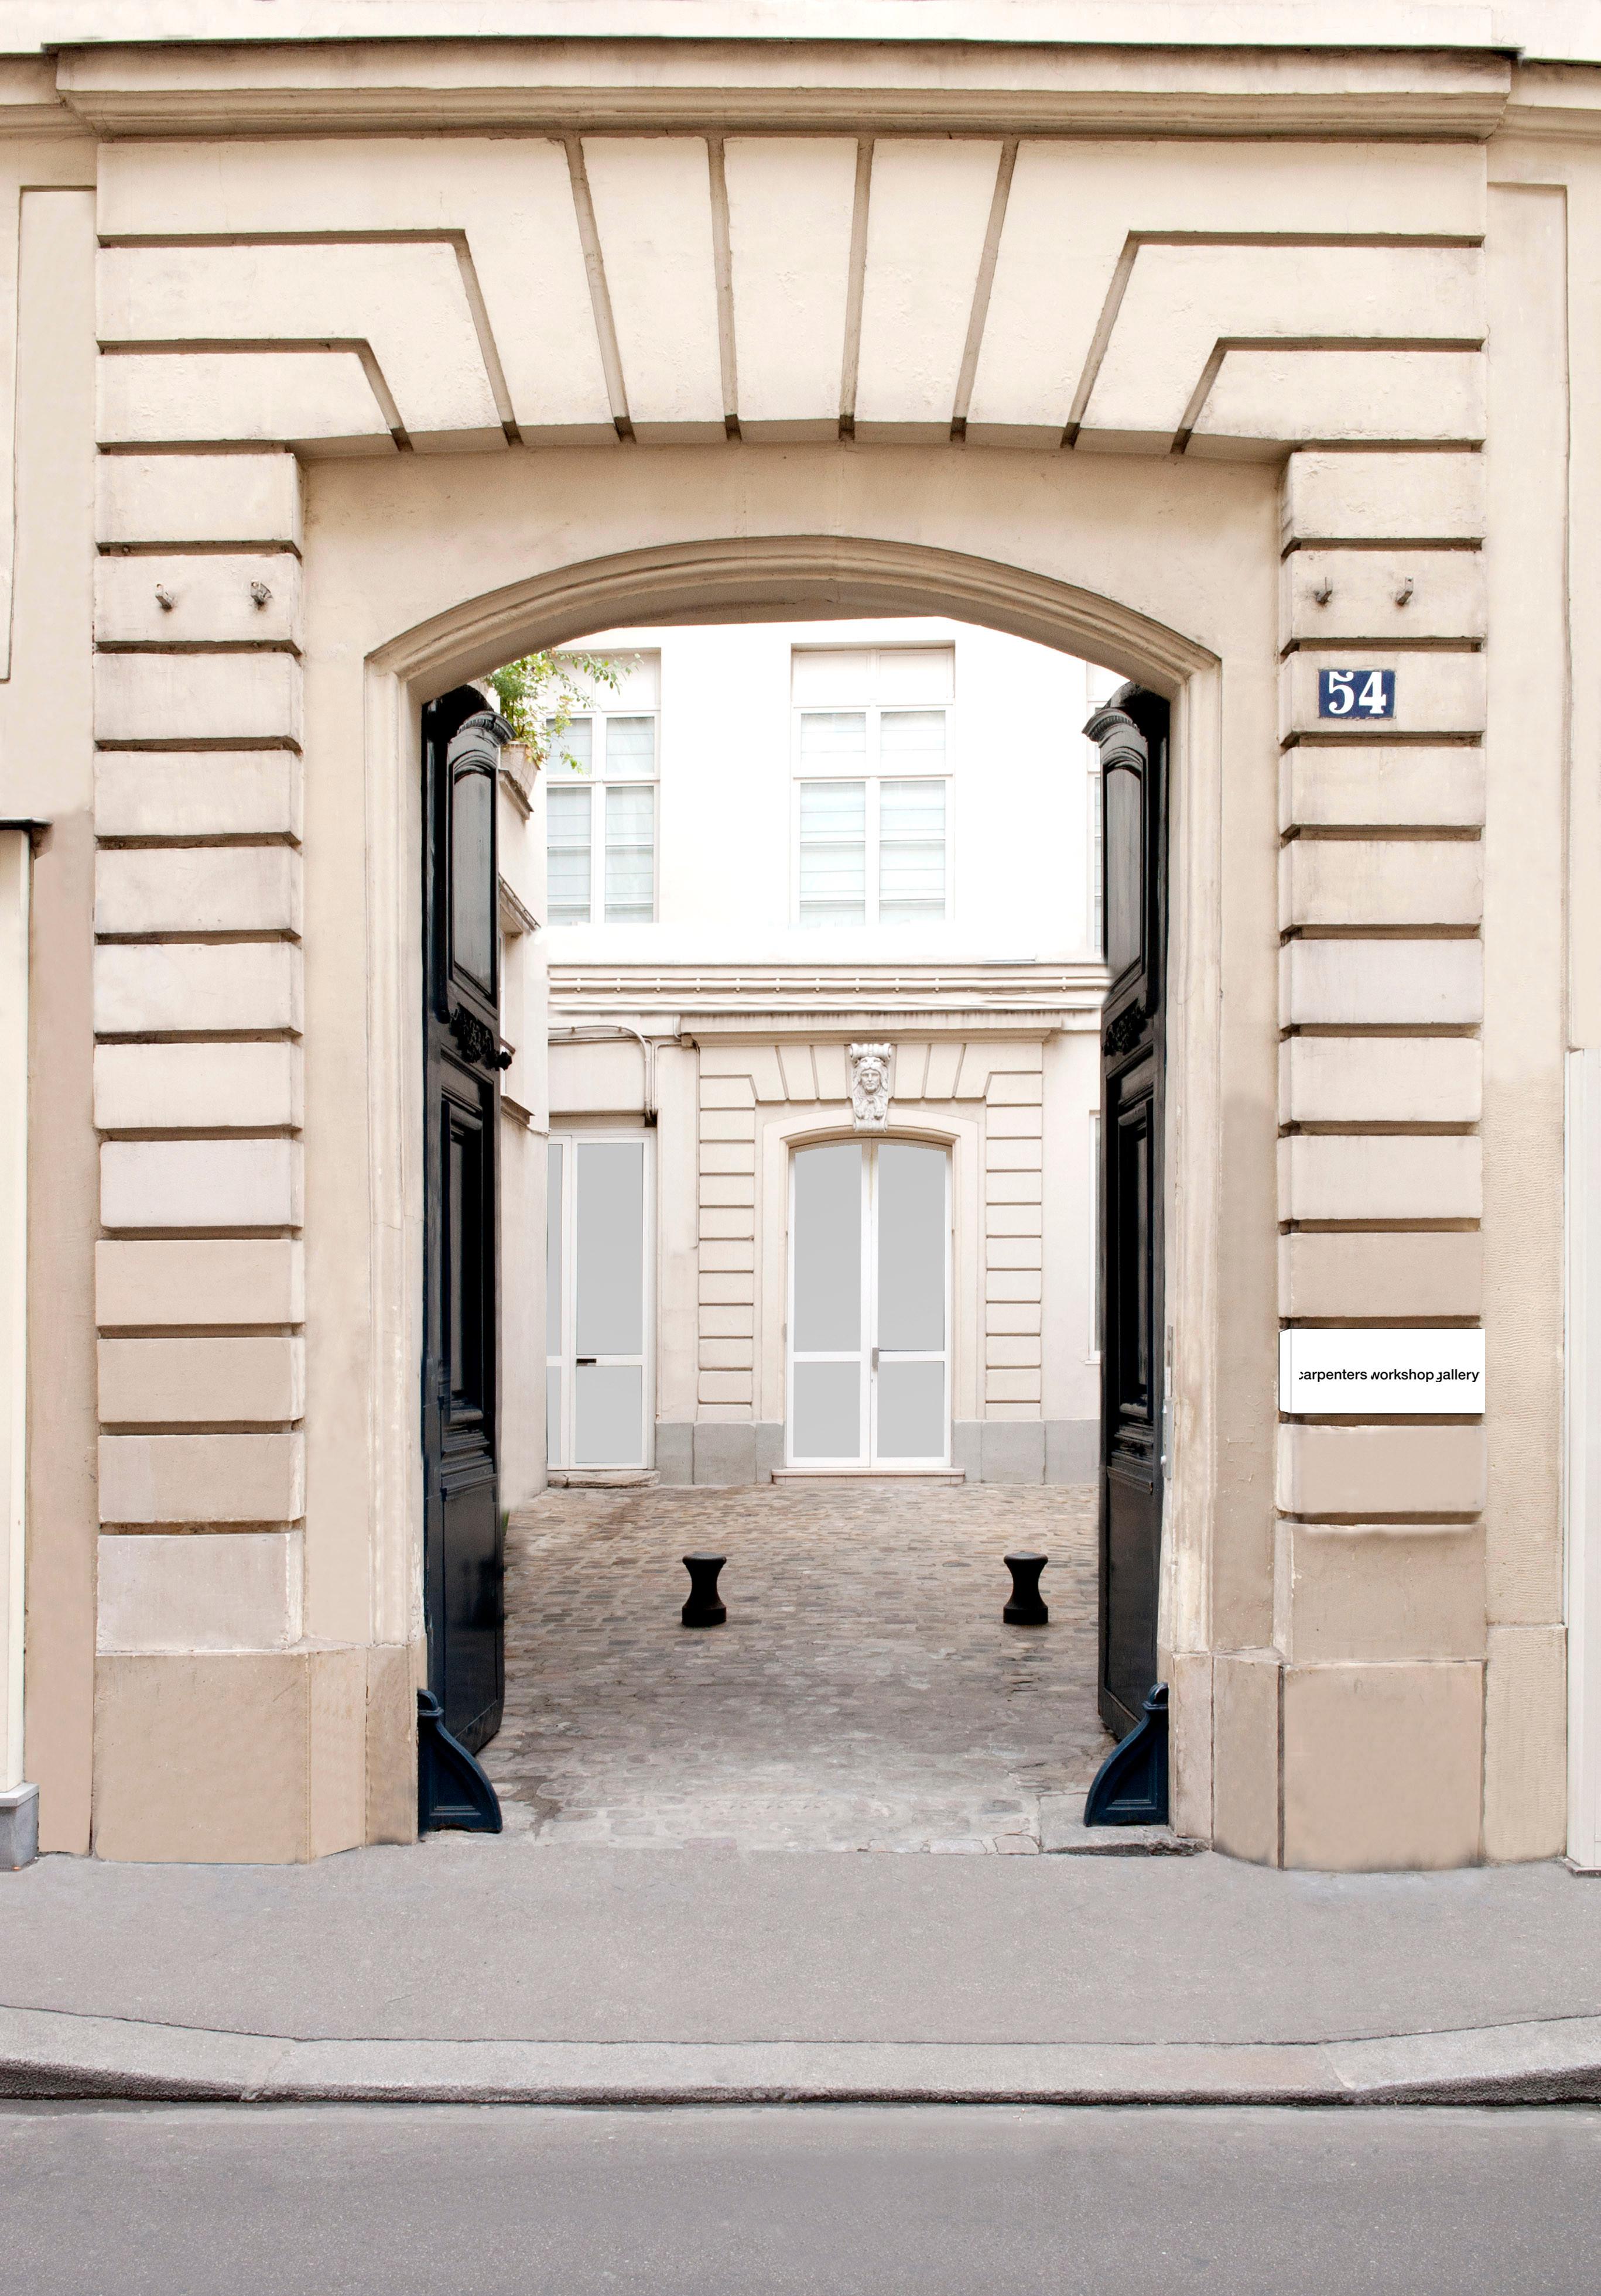 CARPENTERS WORKSHOP GALLERY_Paris Marais.jpg